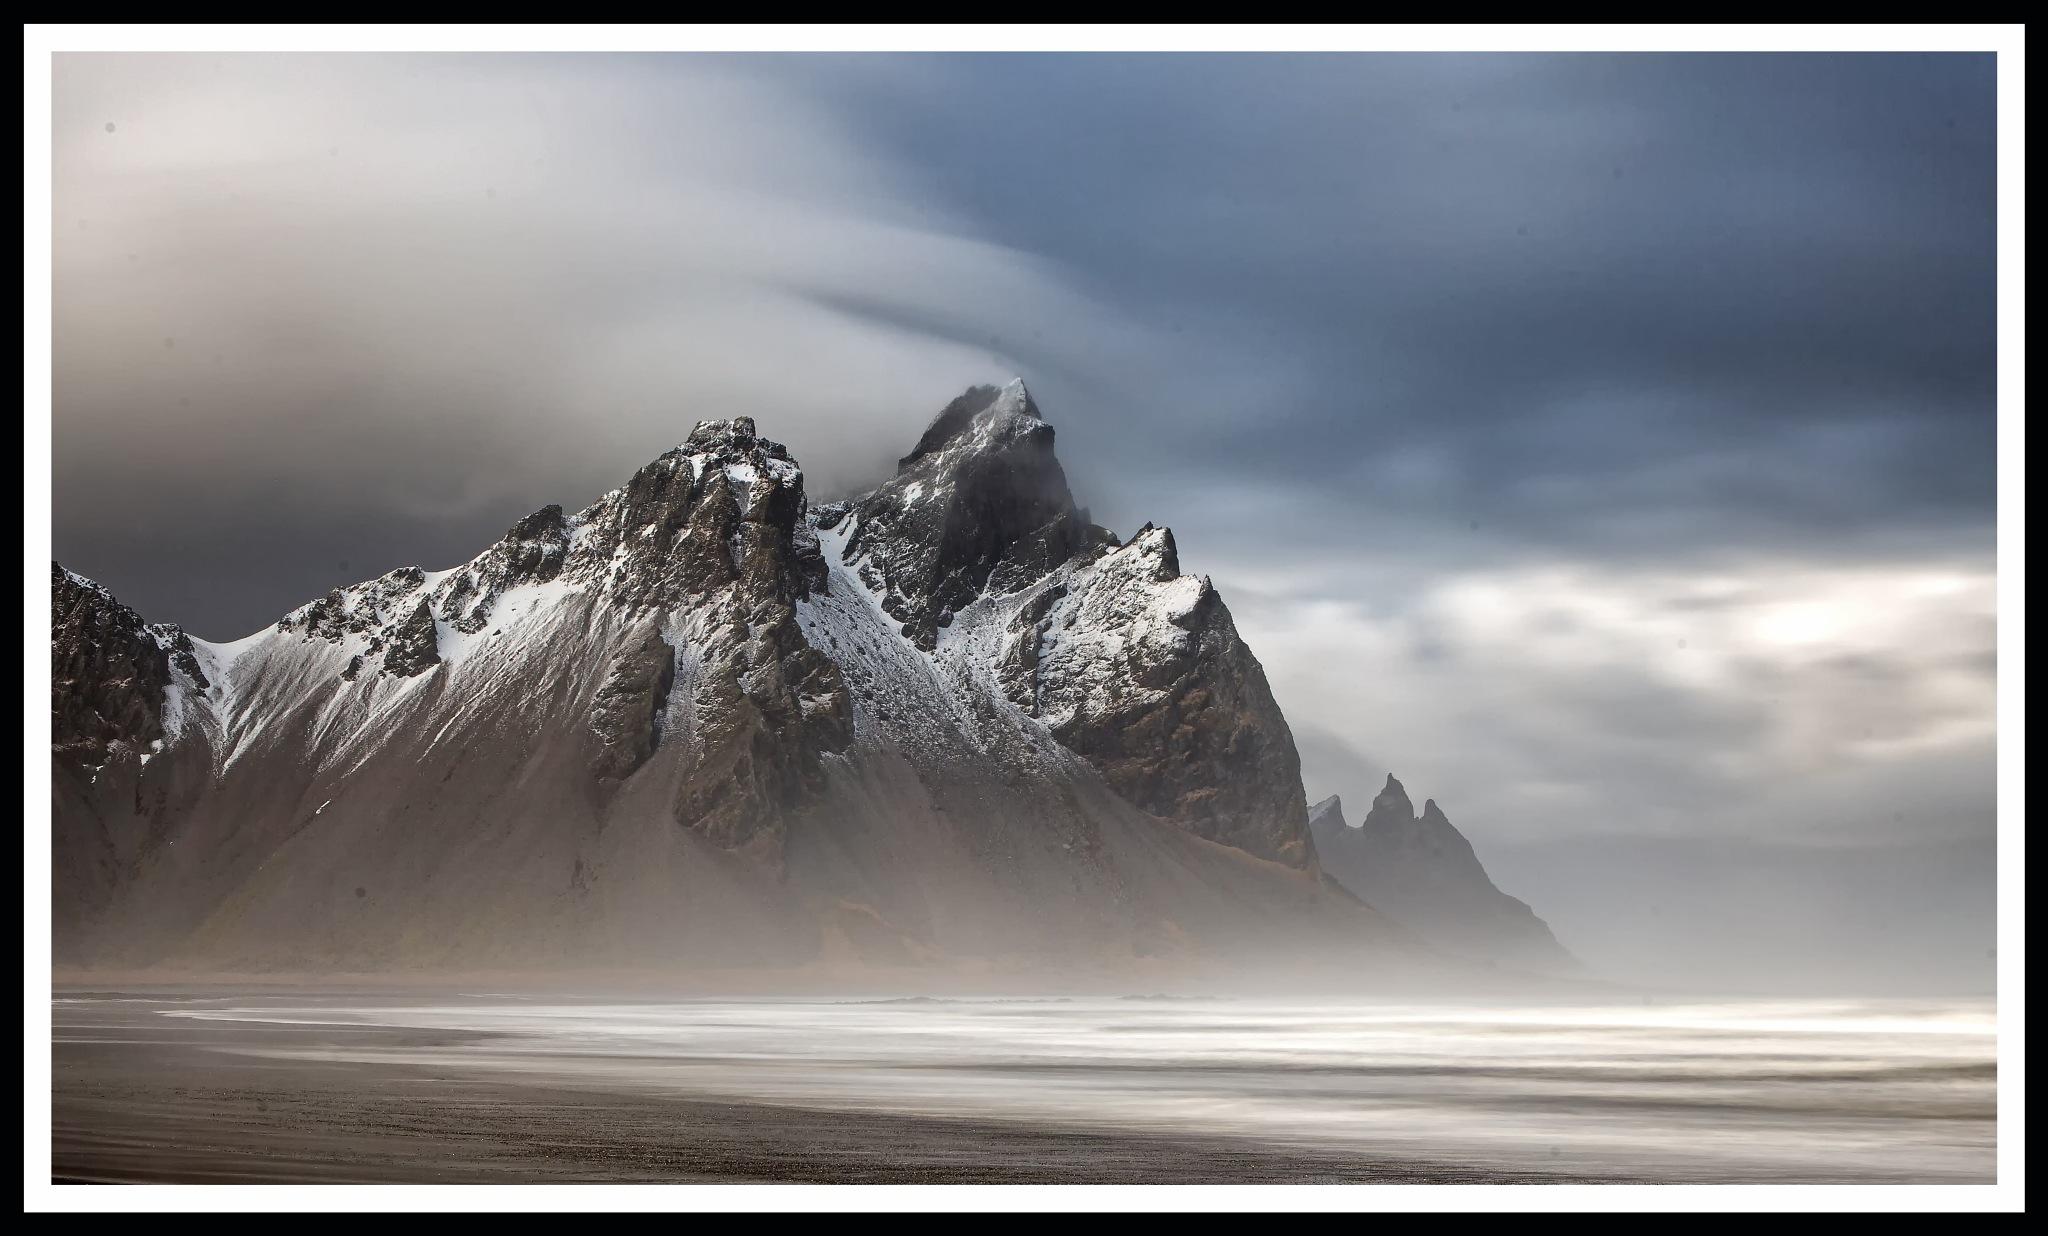 Eastern summit of the Vestrahorn and Brunnhorn by Gordon Dryden